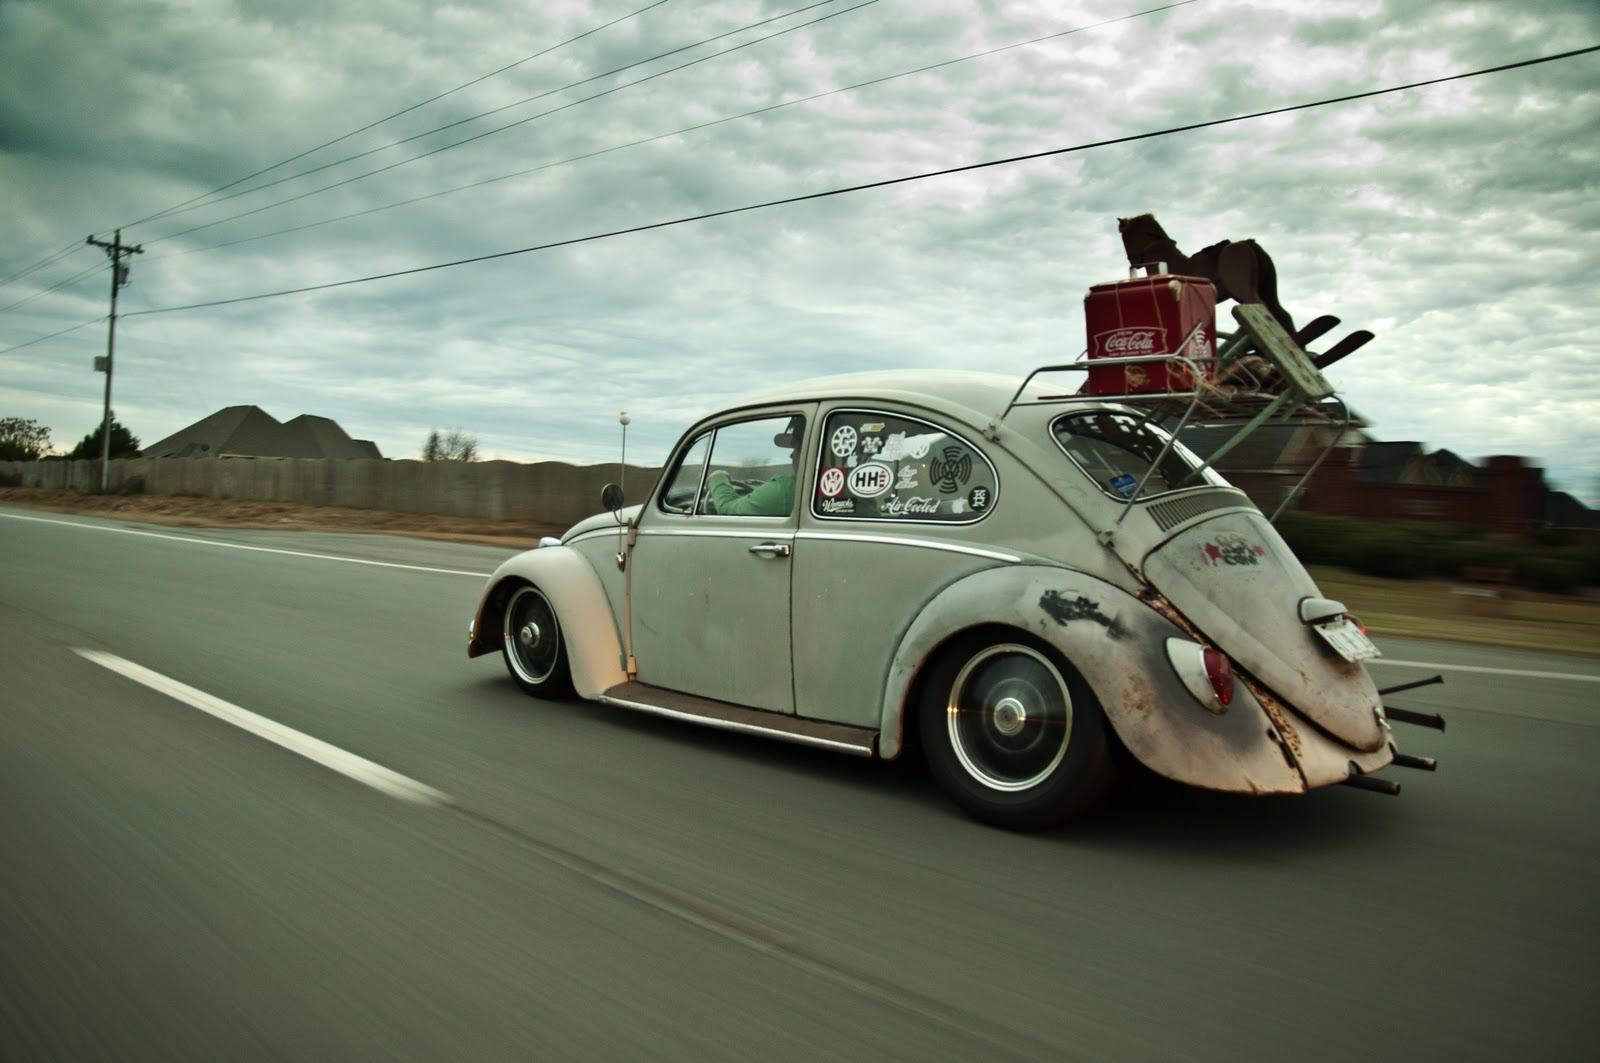 Otis - my '65 Beetle DSC_0032